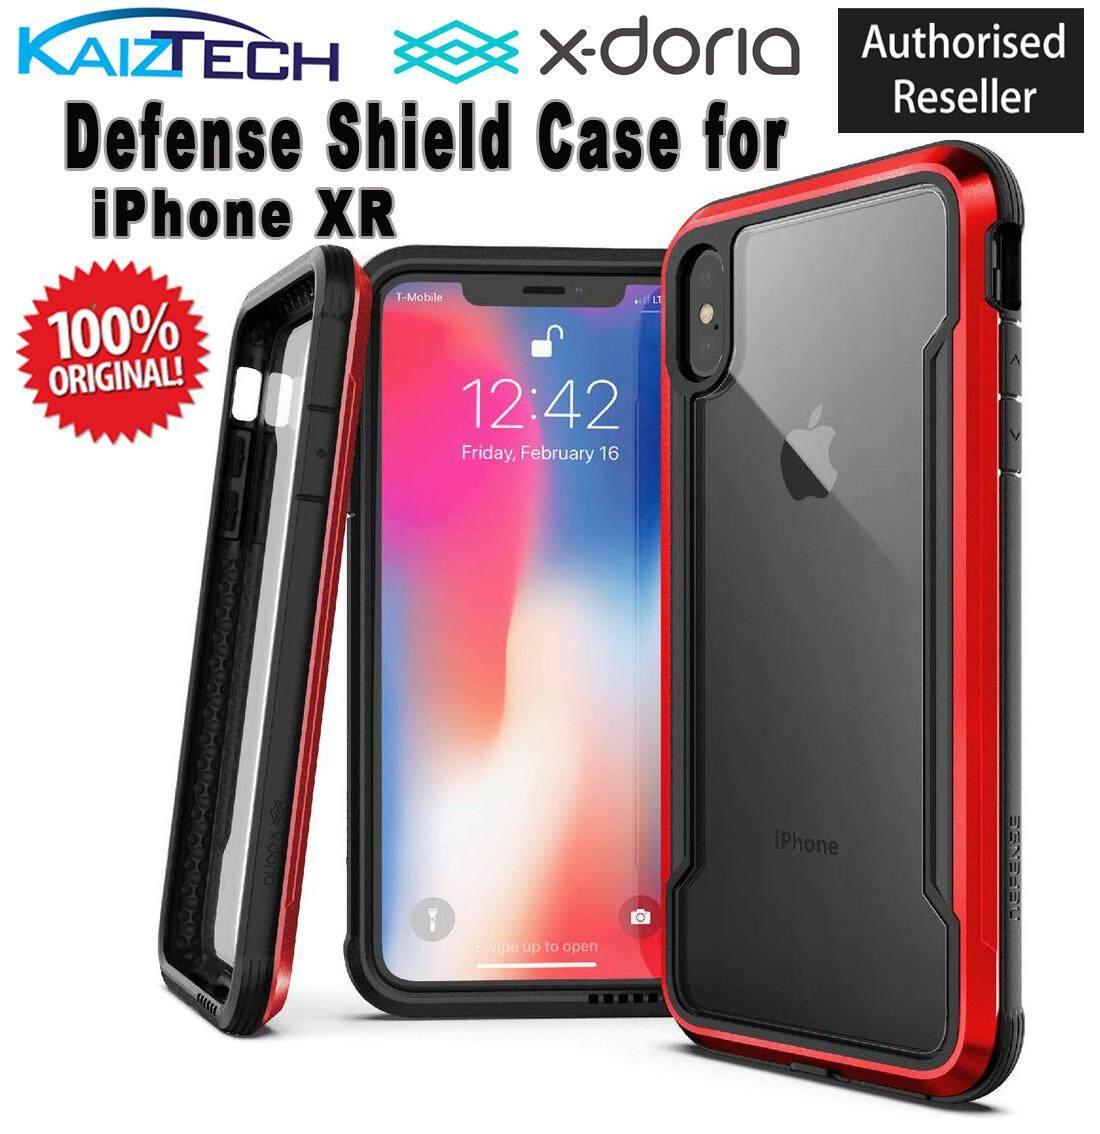 separation shoes 40b01 39e8b X-Doria Apple iPhone XR Defense Shield Case (100% Original)